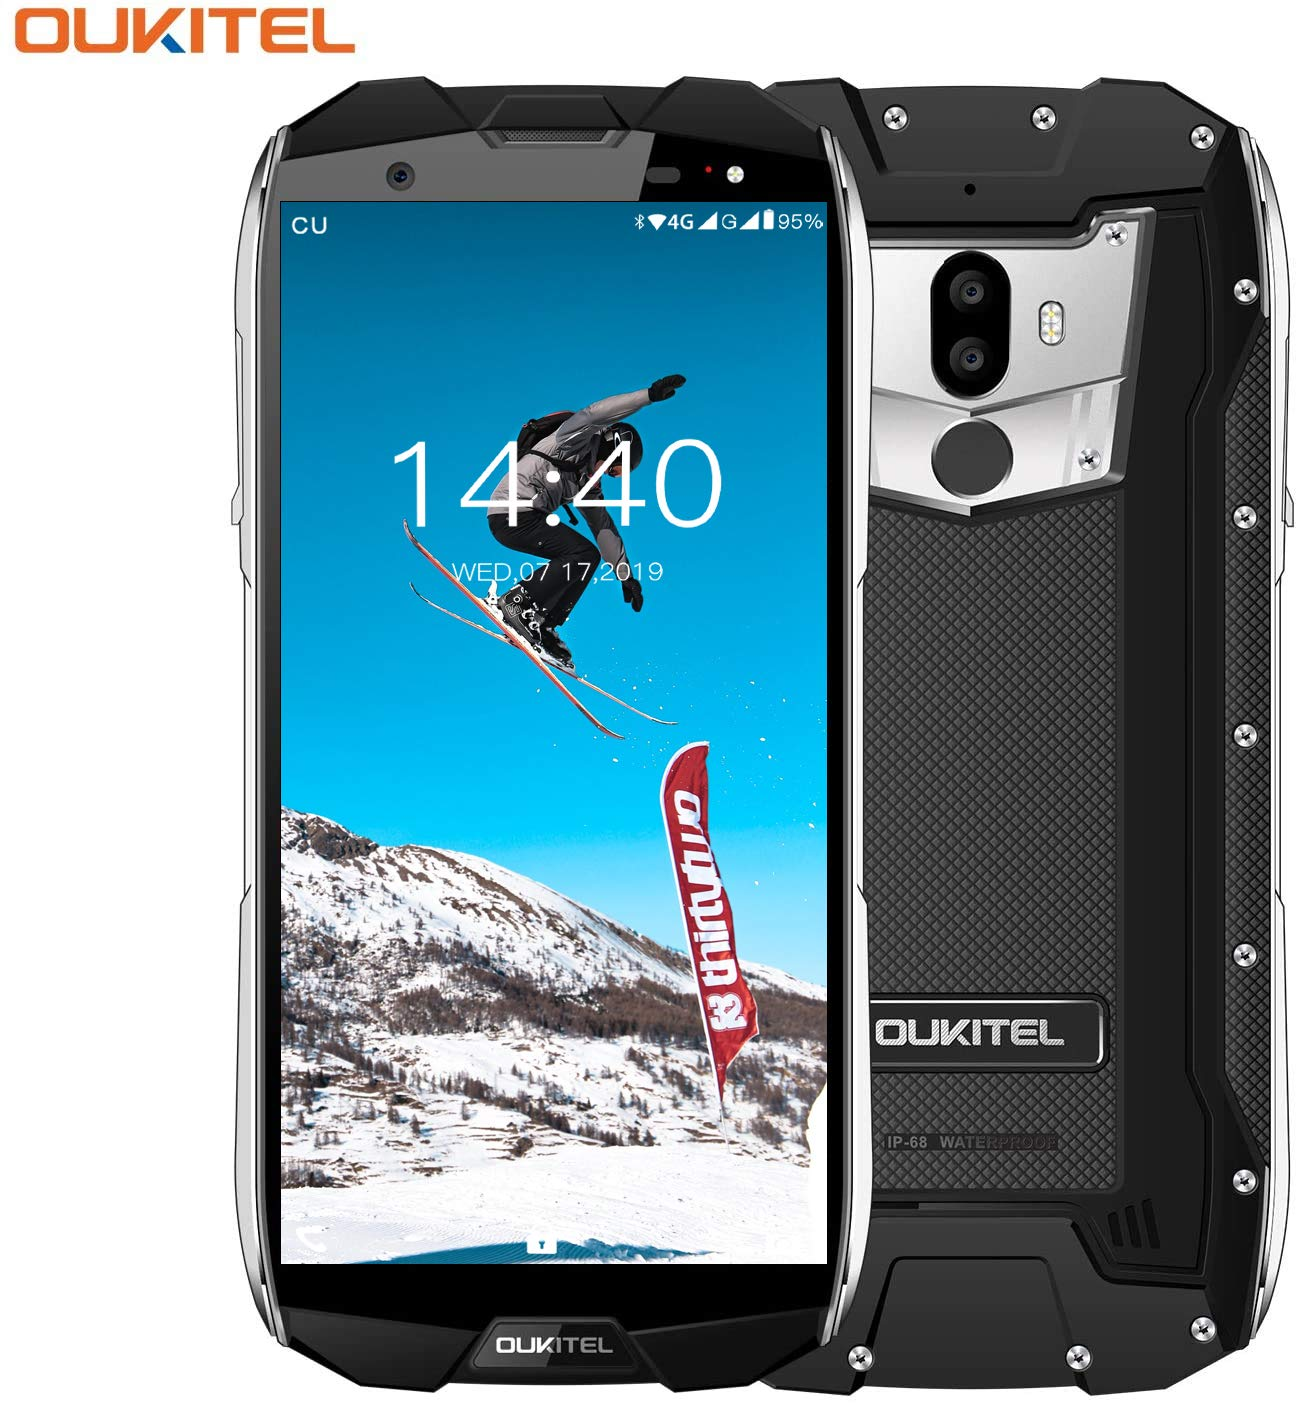 Móvil Libre Resistente,OUKITEL WP5000 Teléfono Móvil a Prueba de ...